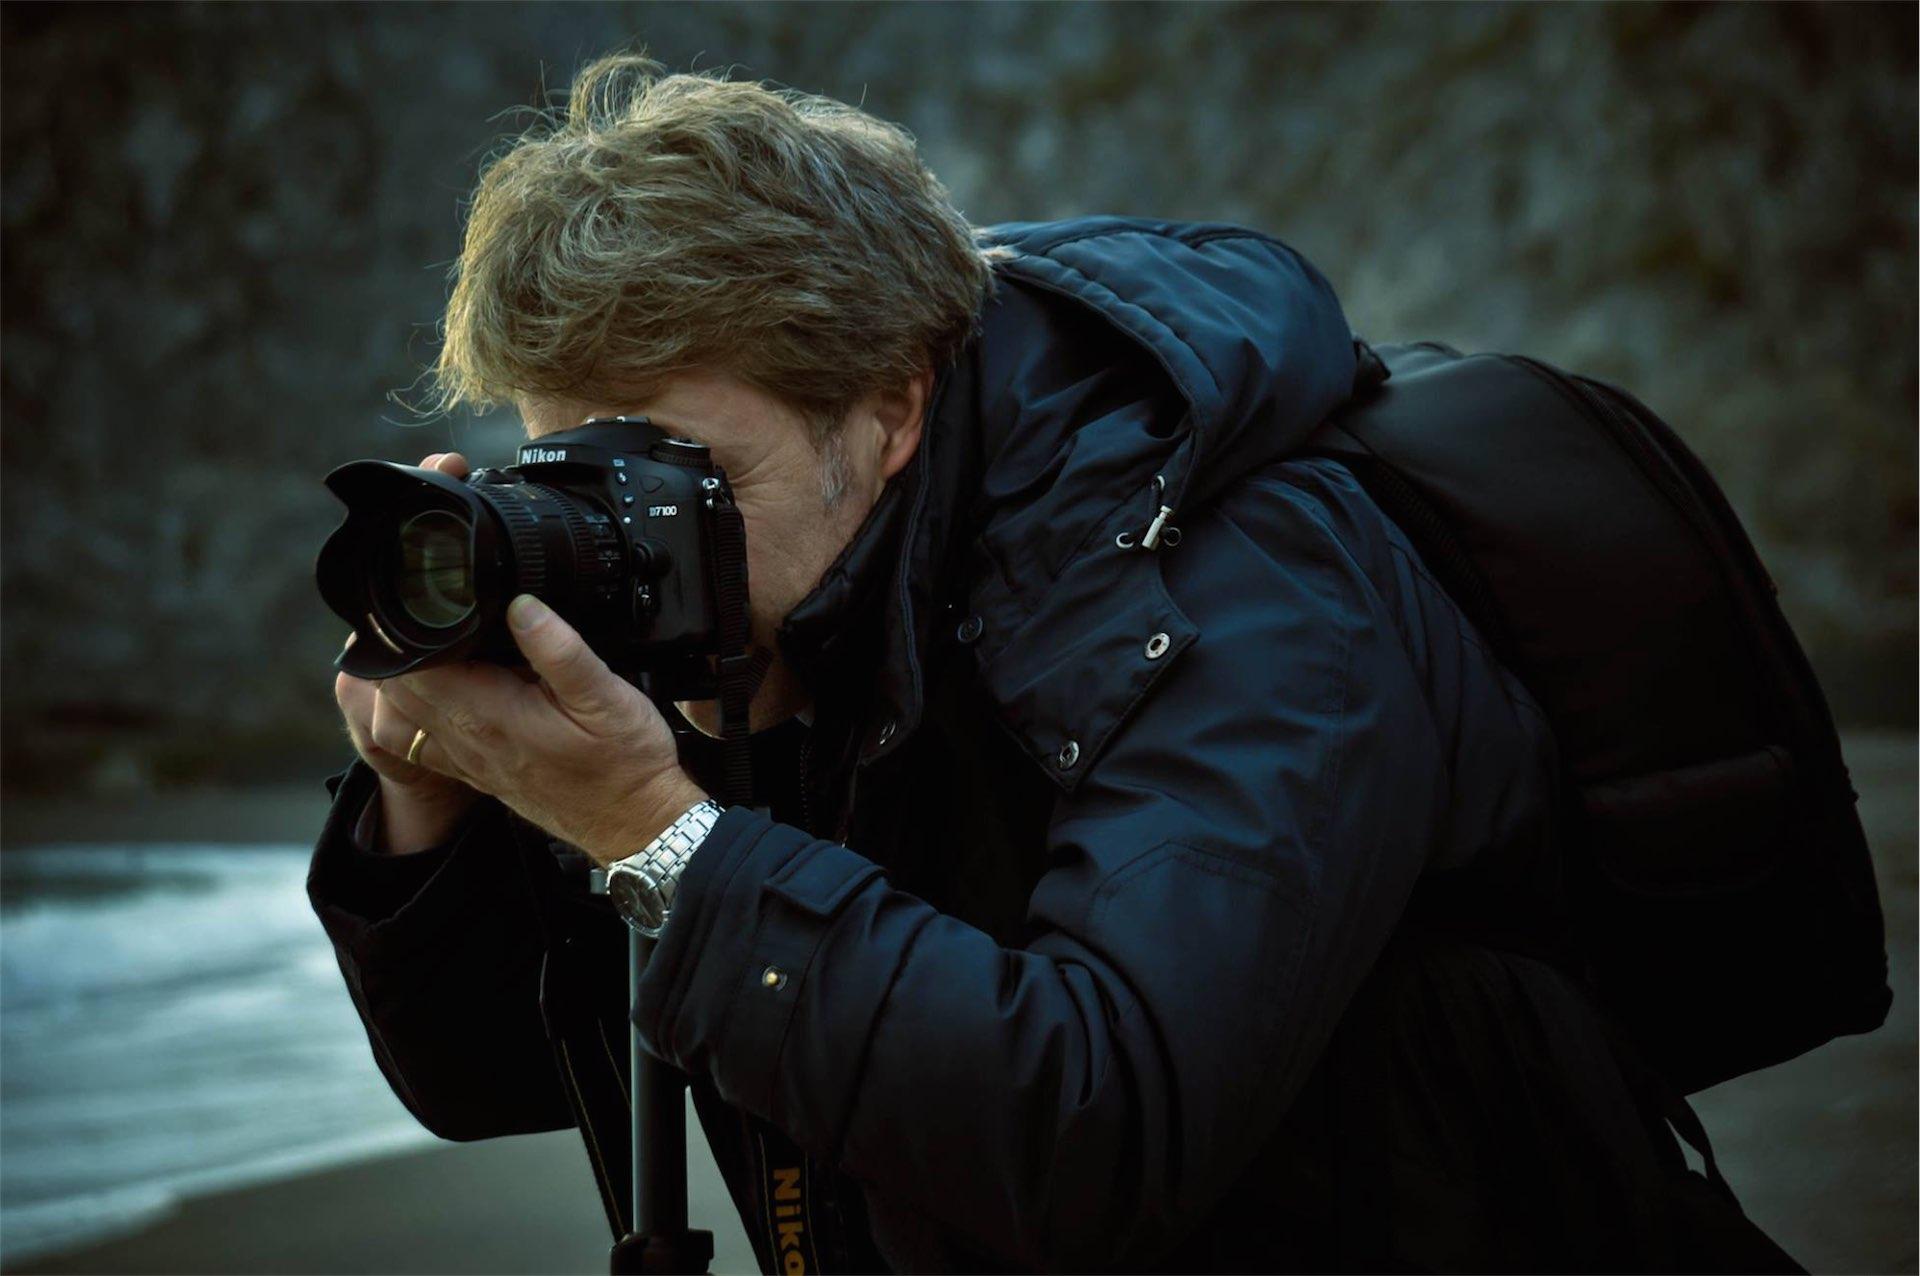 Armando Montella Photography